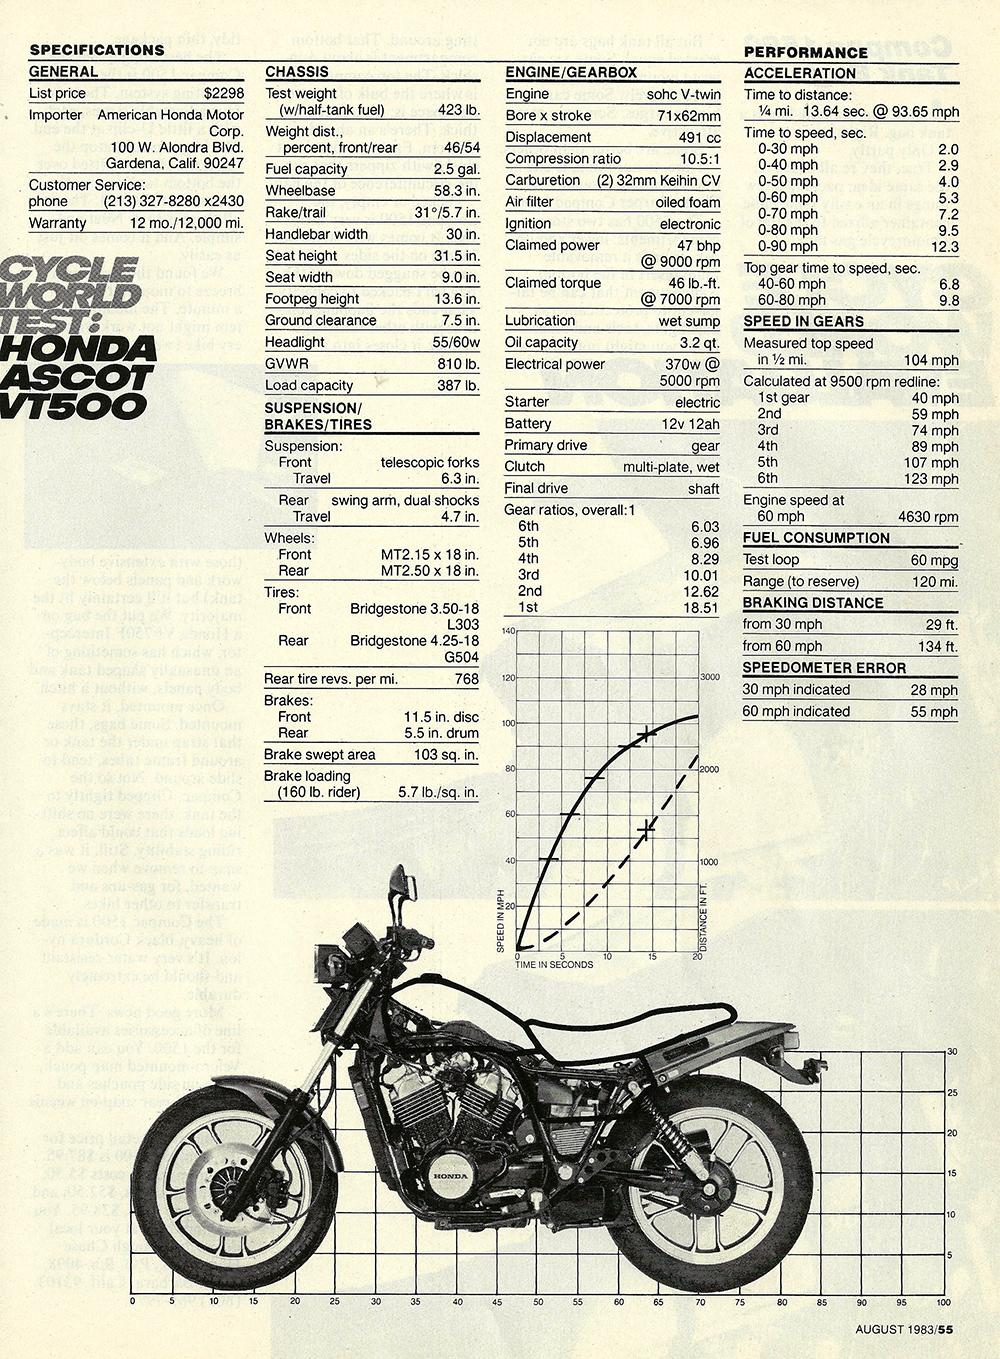 1983 Honda VT500 Ascot road test 2 06.JPG